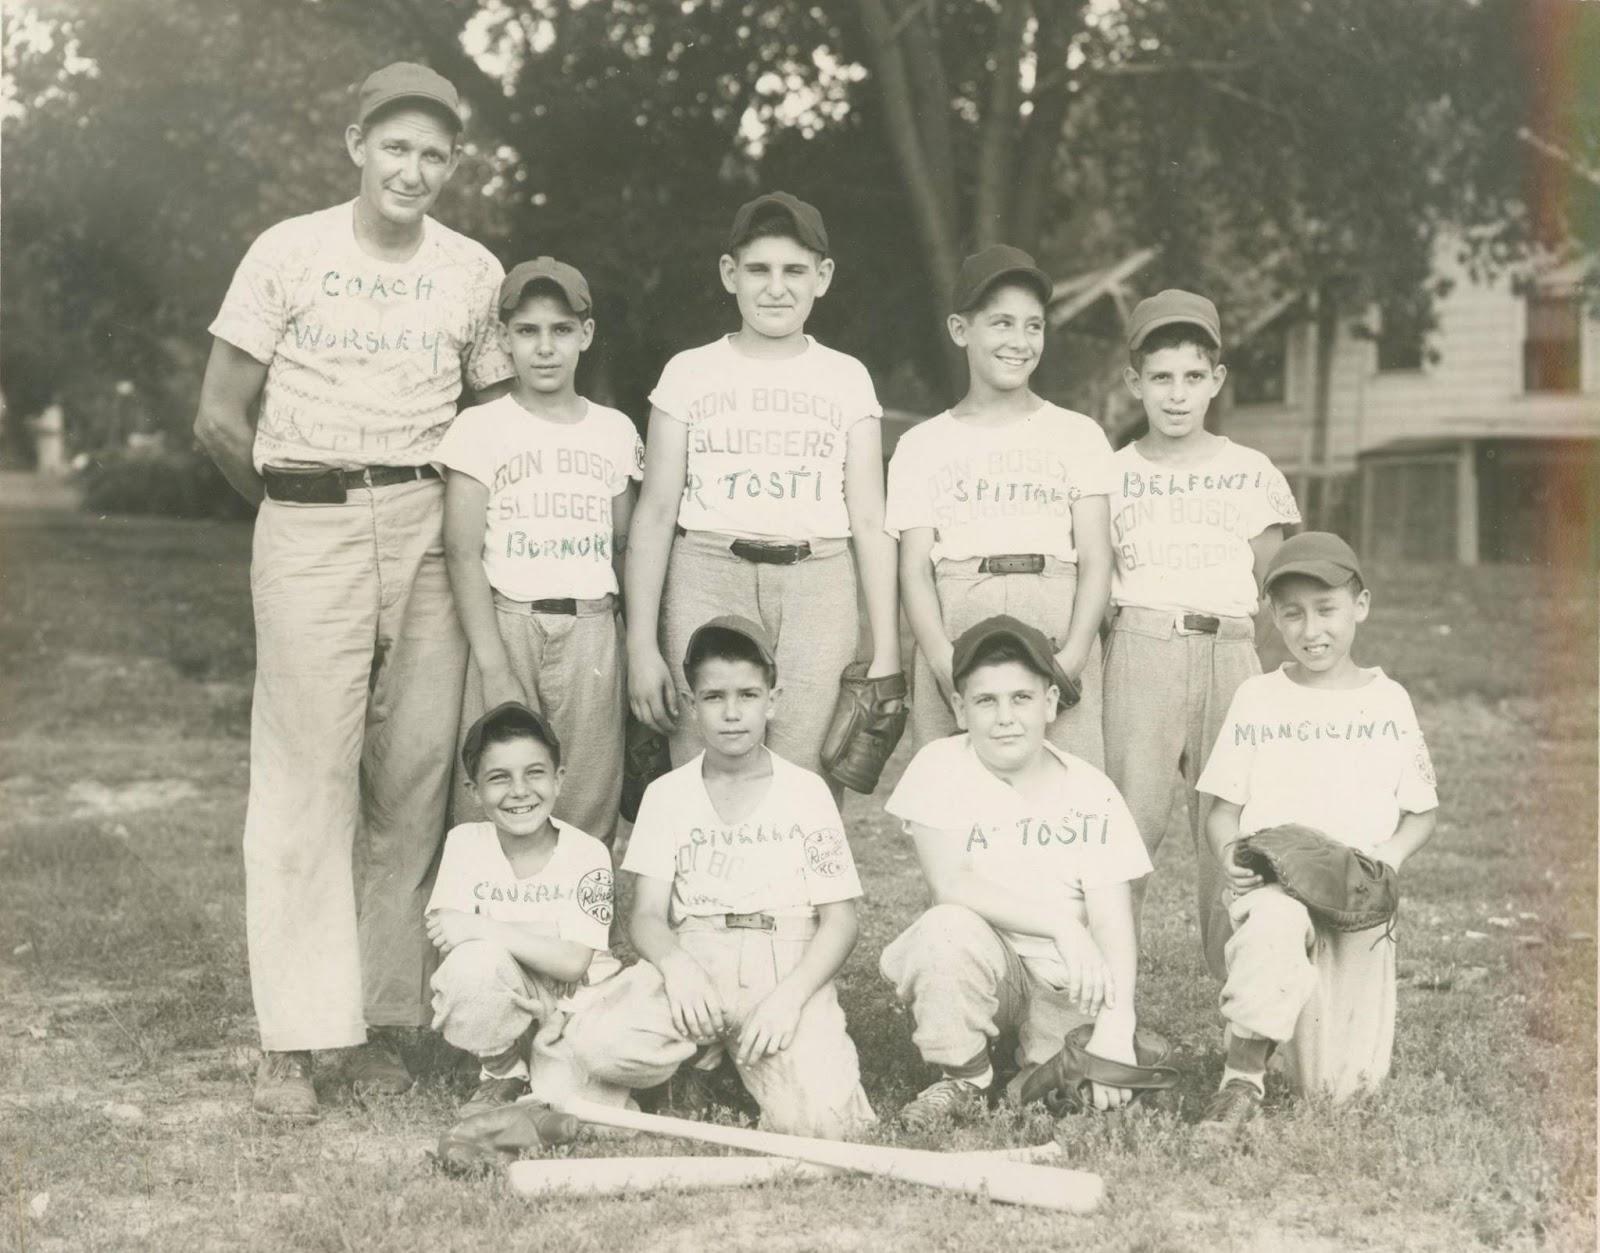 The Don Bosco Sluggers.